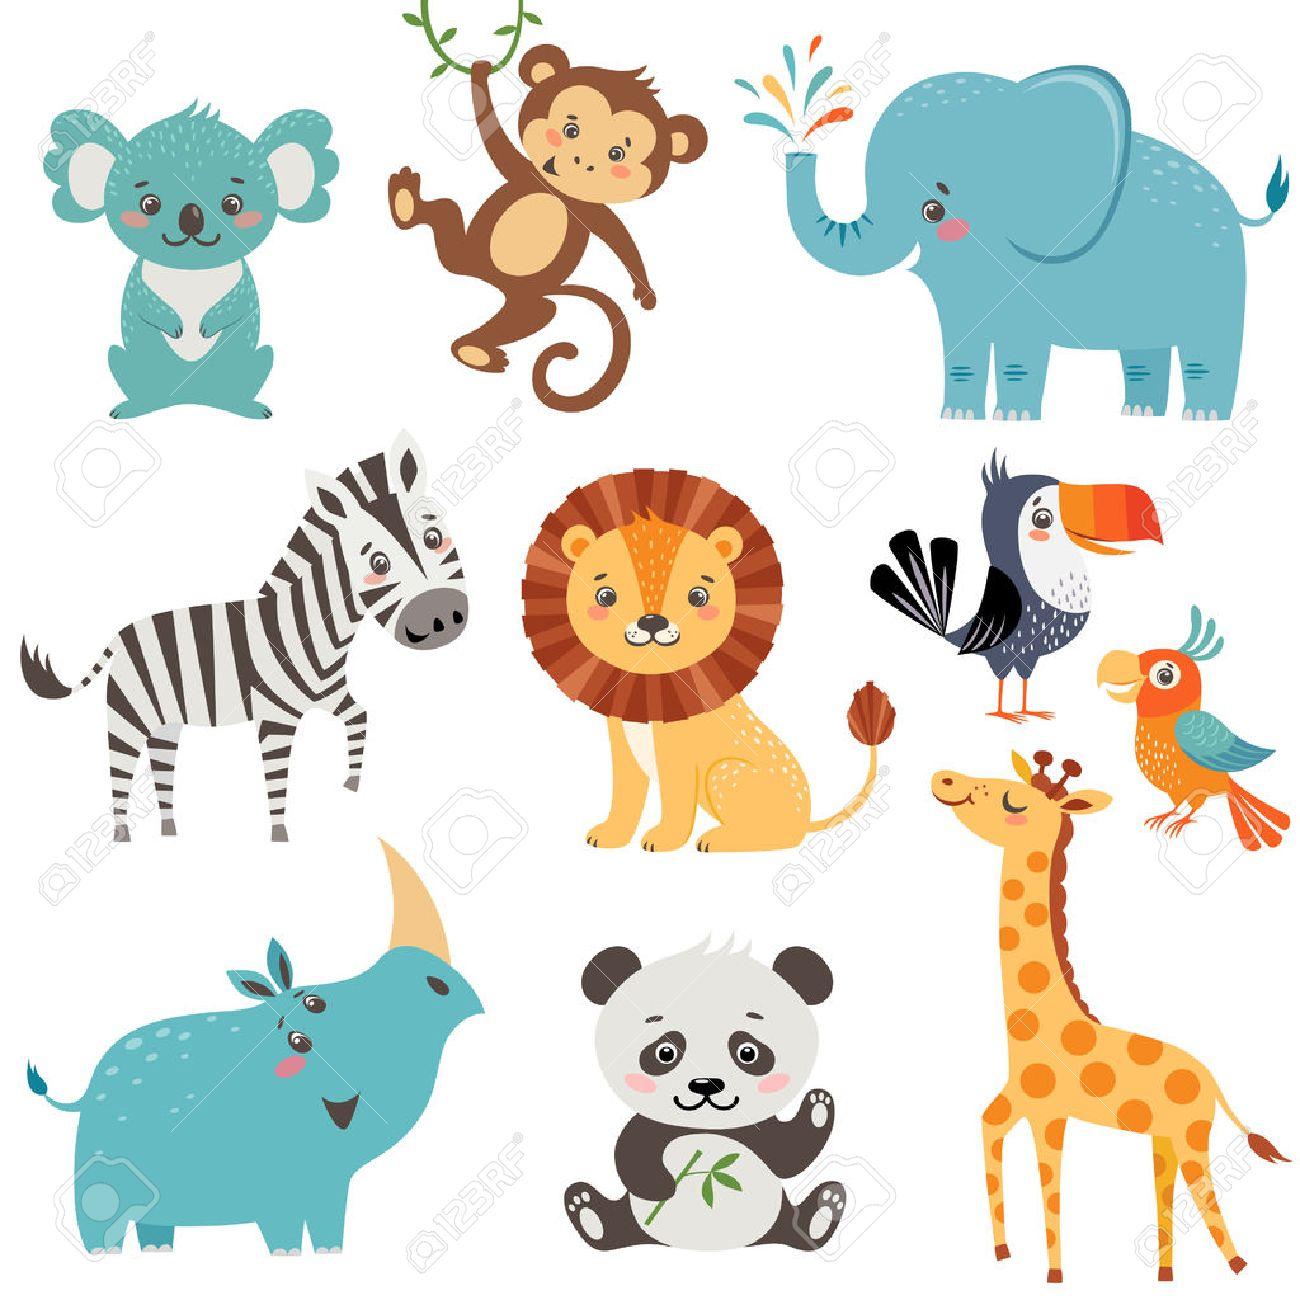 Set of cute animals isolated on white background - 51358394